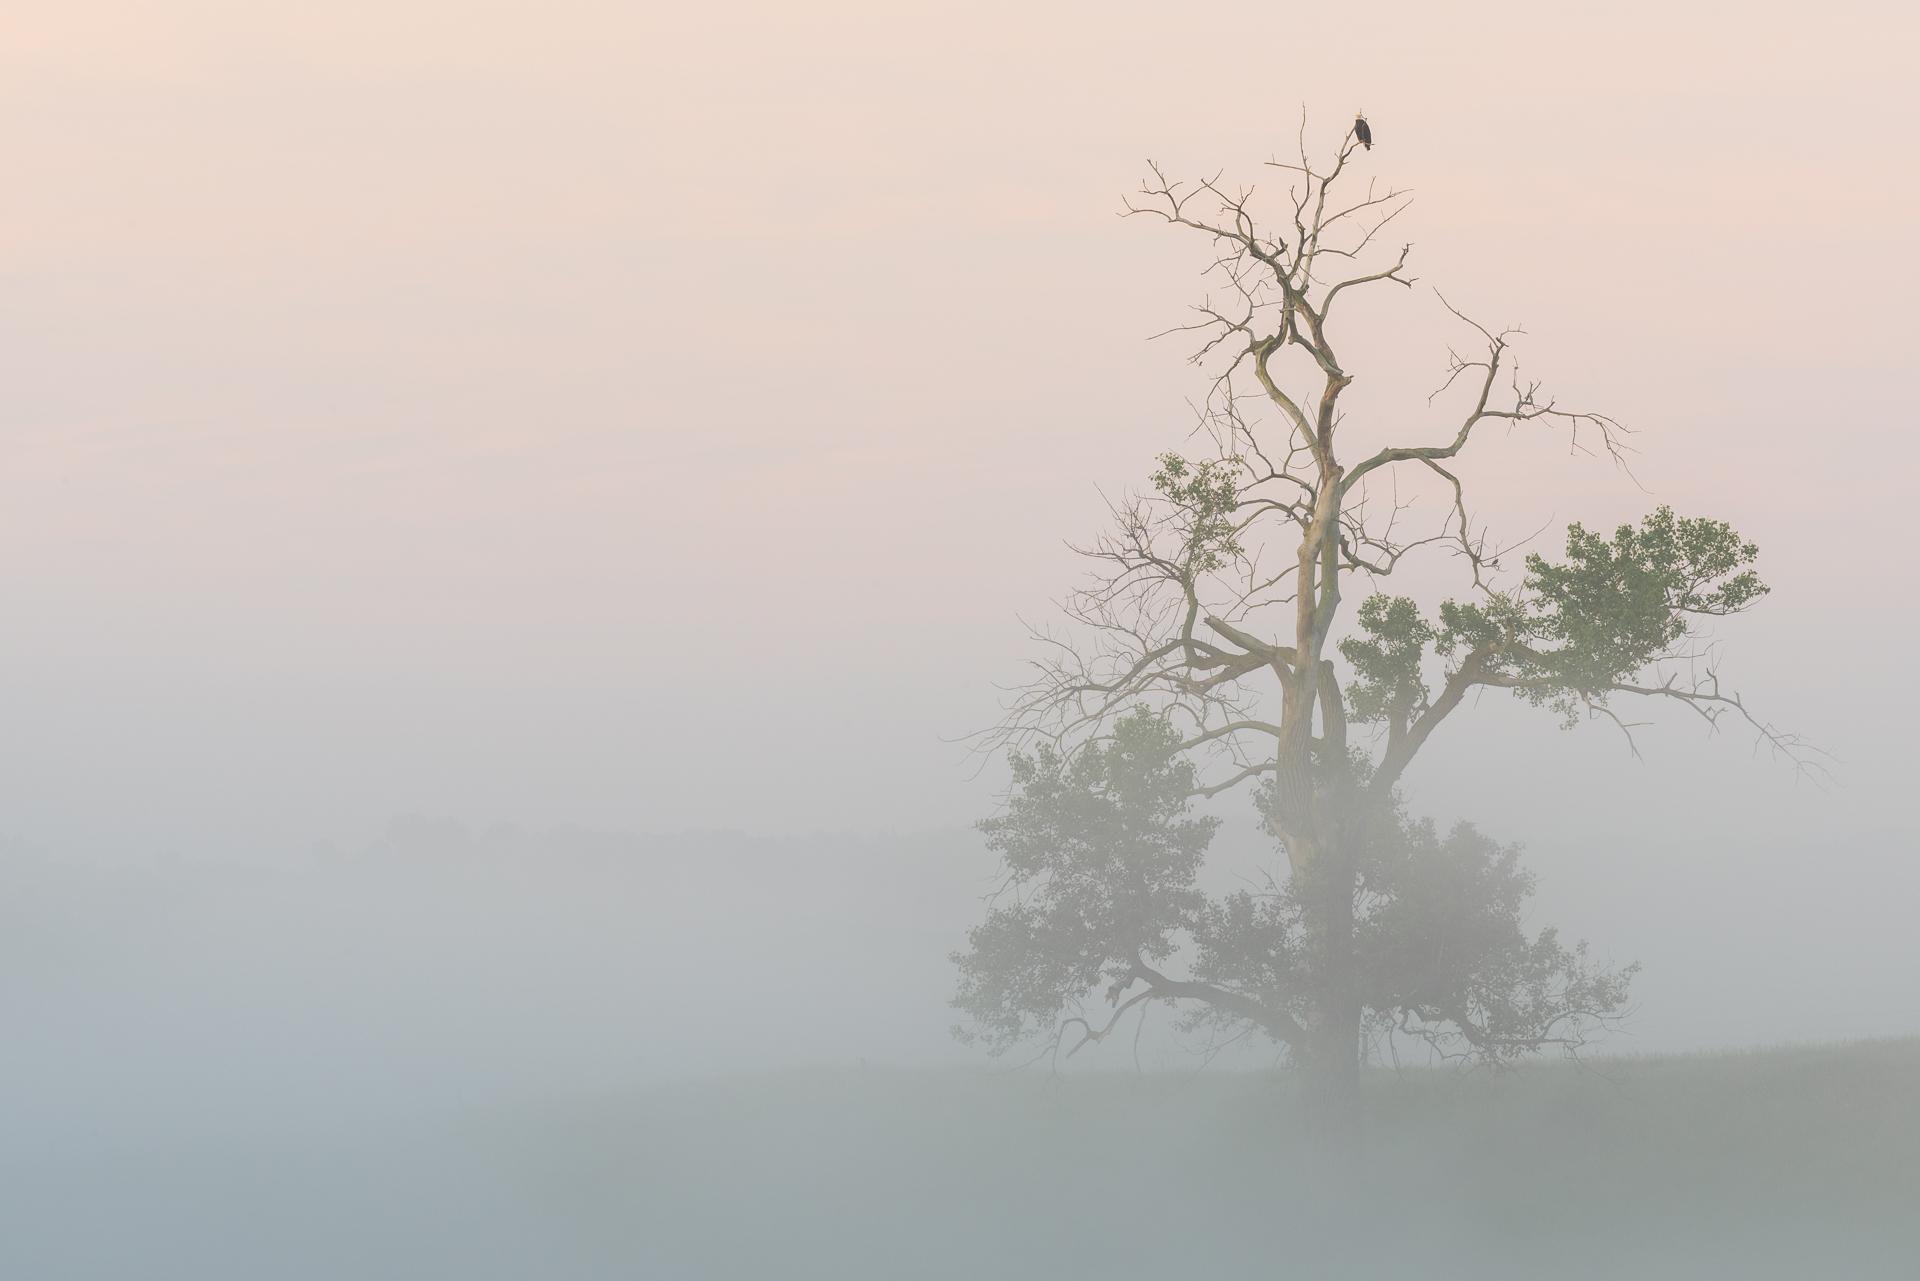 Foggy morning: bald eagle in cottonwood tree